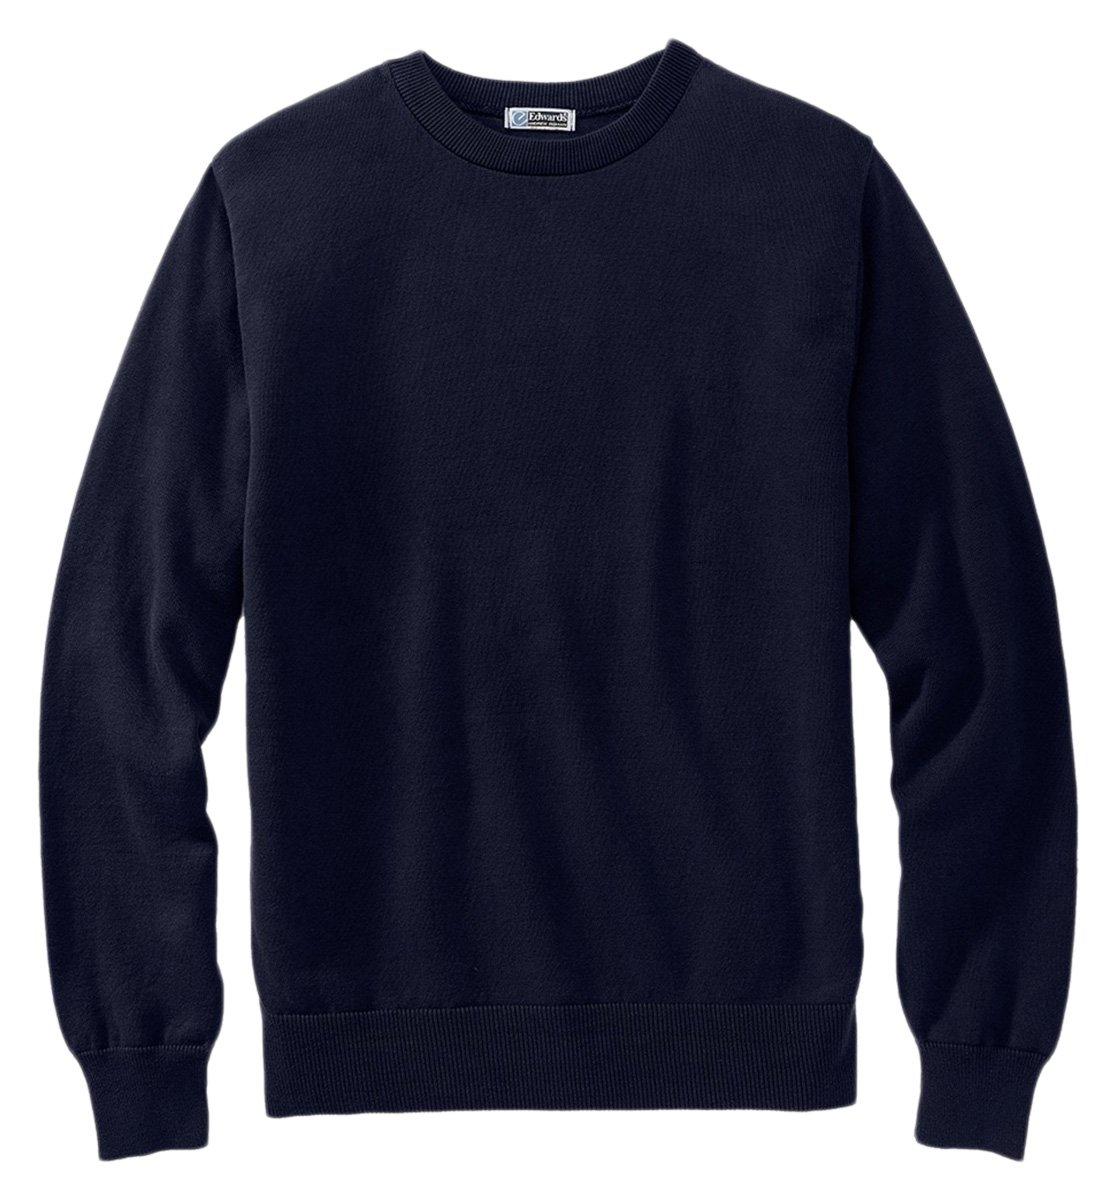 Ed Garments Men's Fine Gauge Crew Neck Sweater, NAVY, X-Large